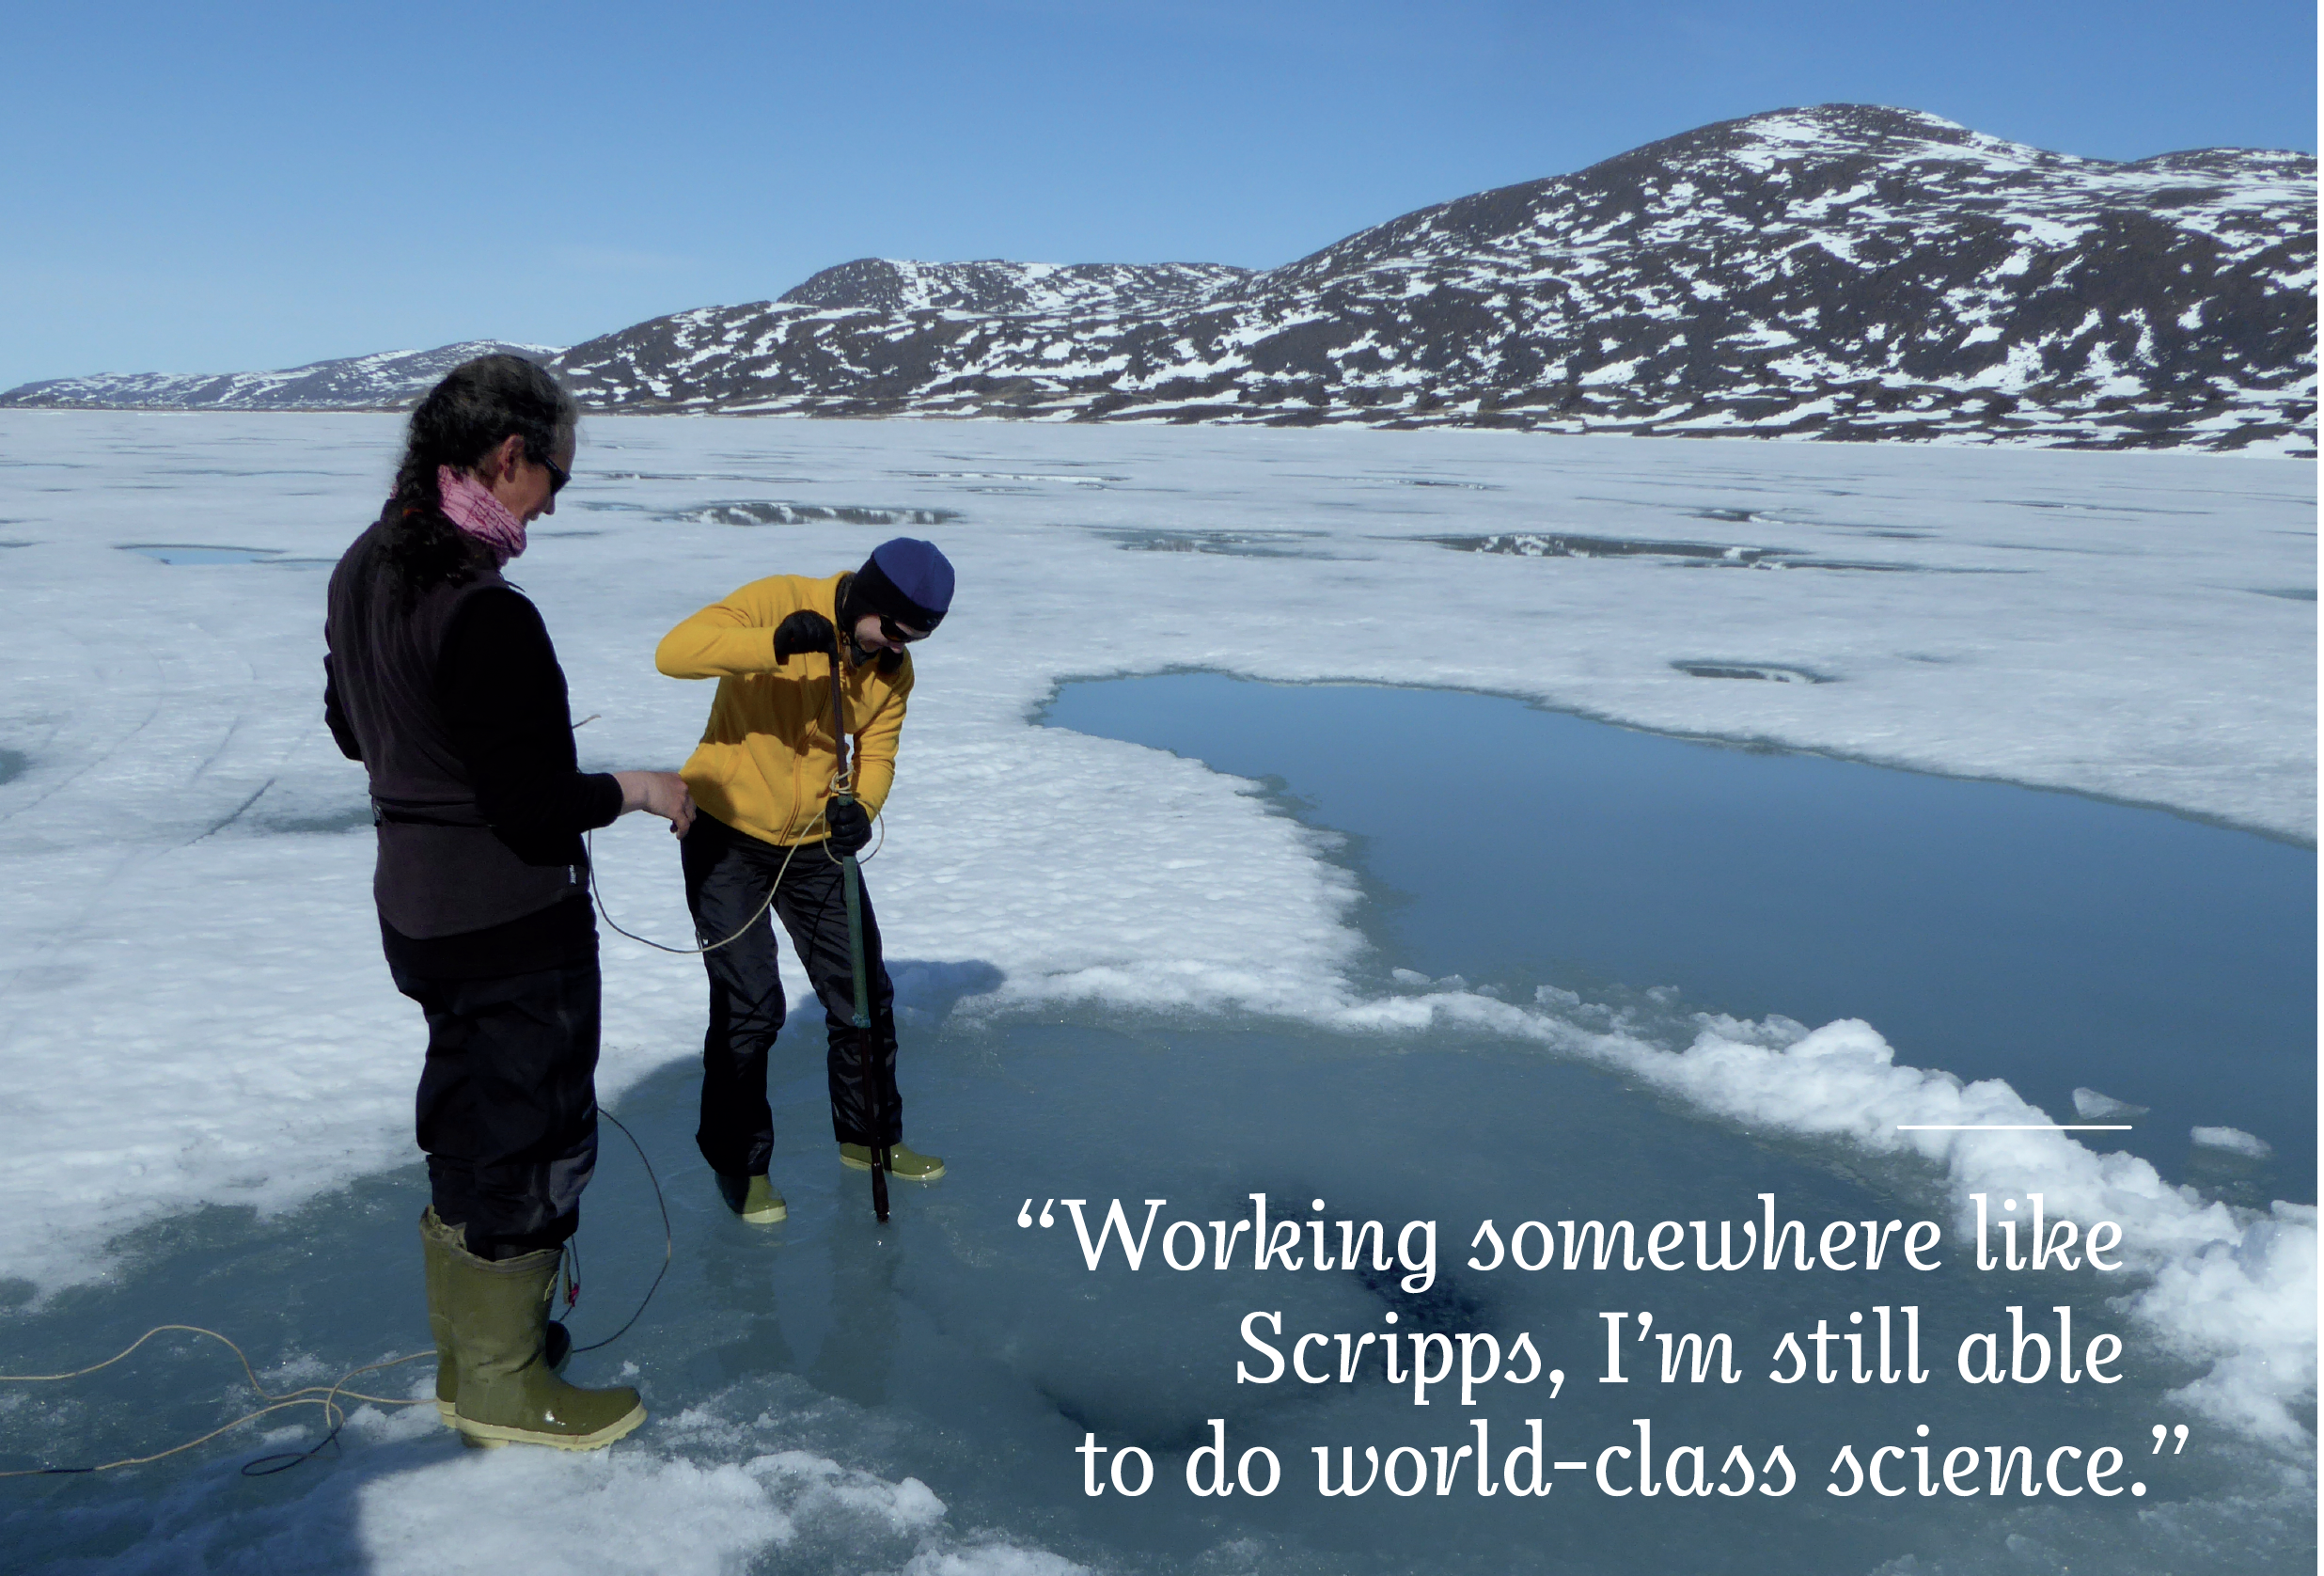 World-class science